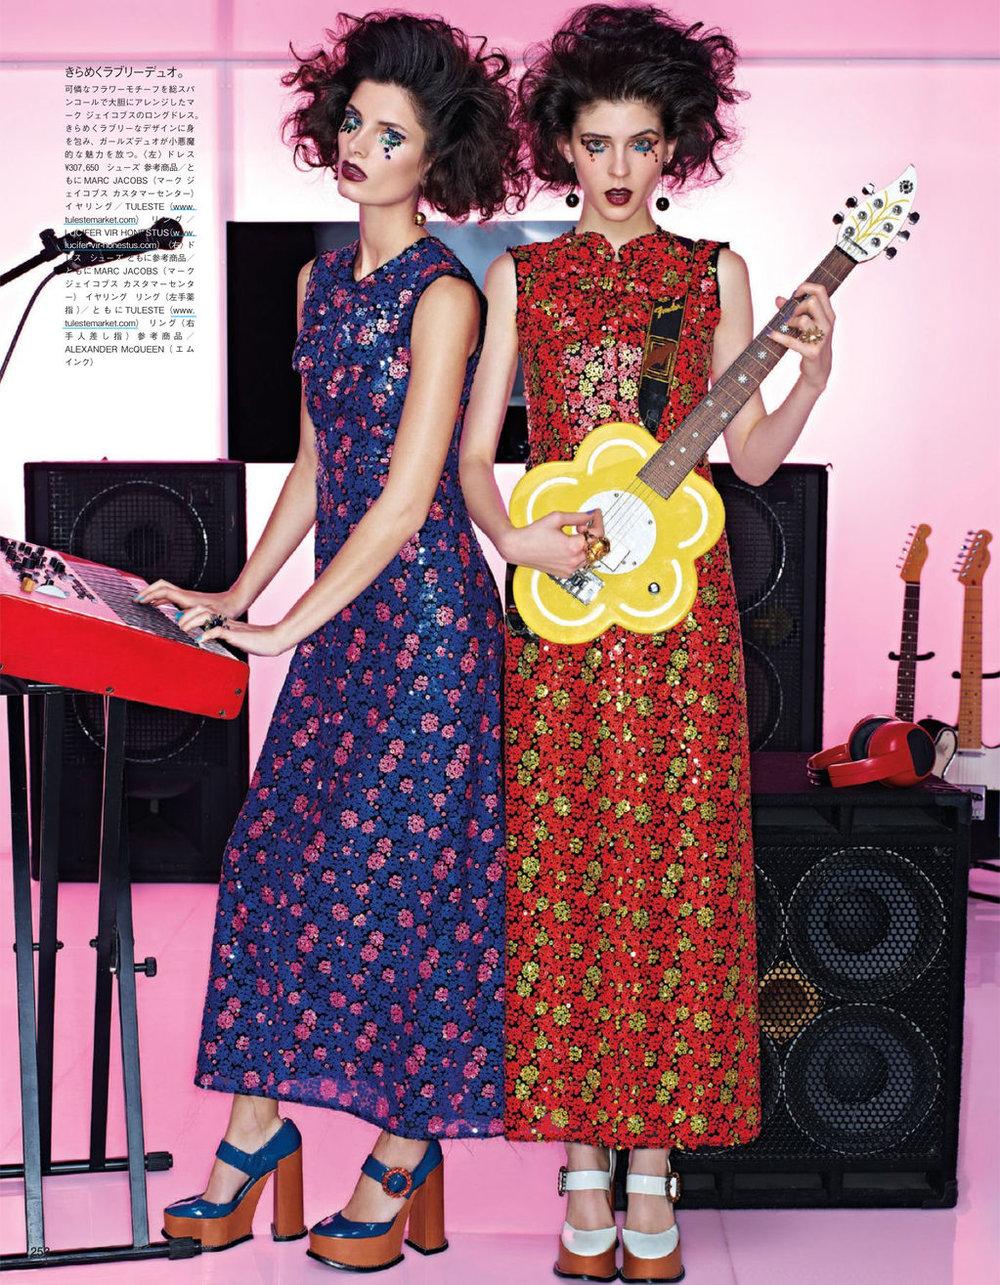 Giovanna-Battaglia-8-Girls-in-the-Band-Vogue-Japan-Sharif-Hamza.jpg